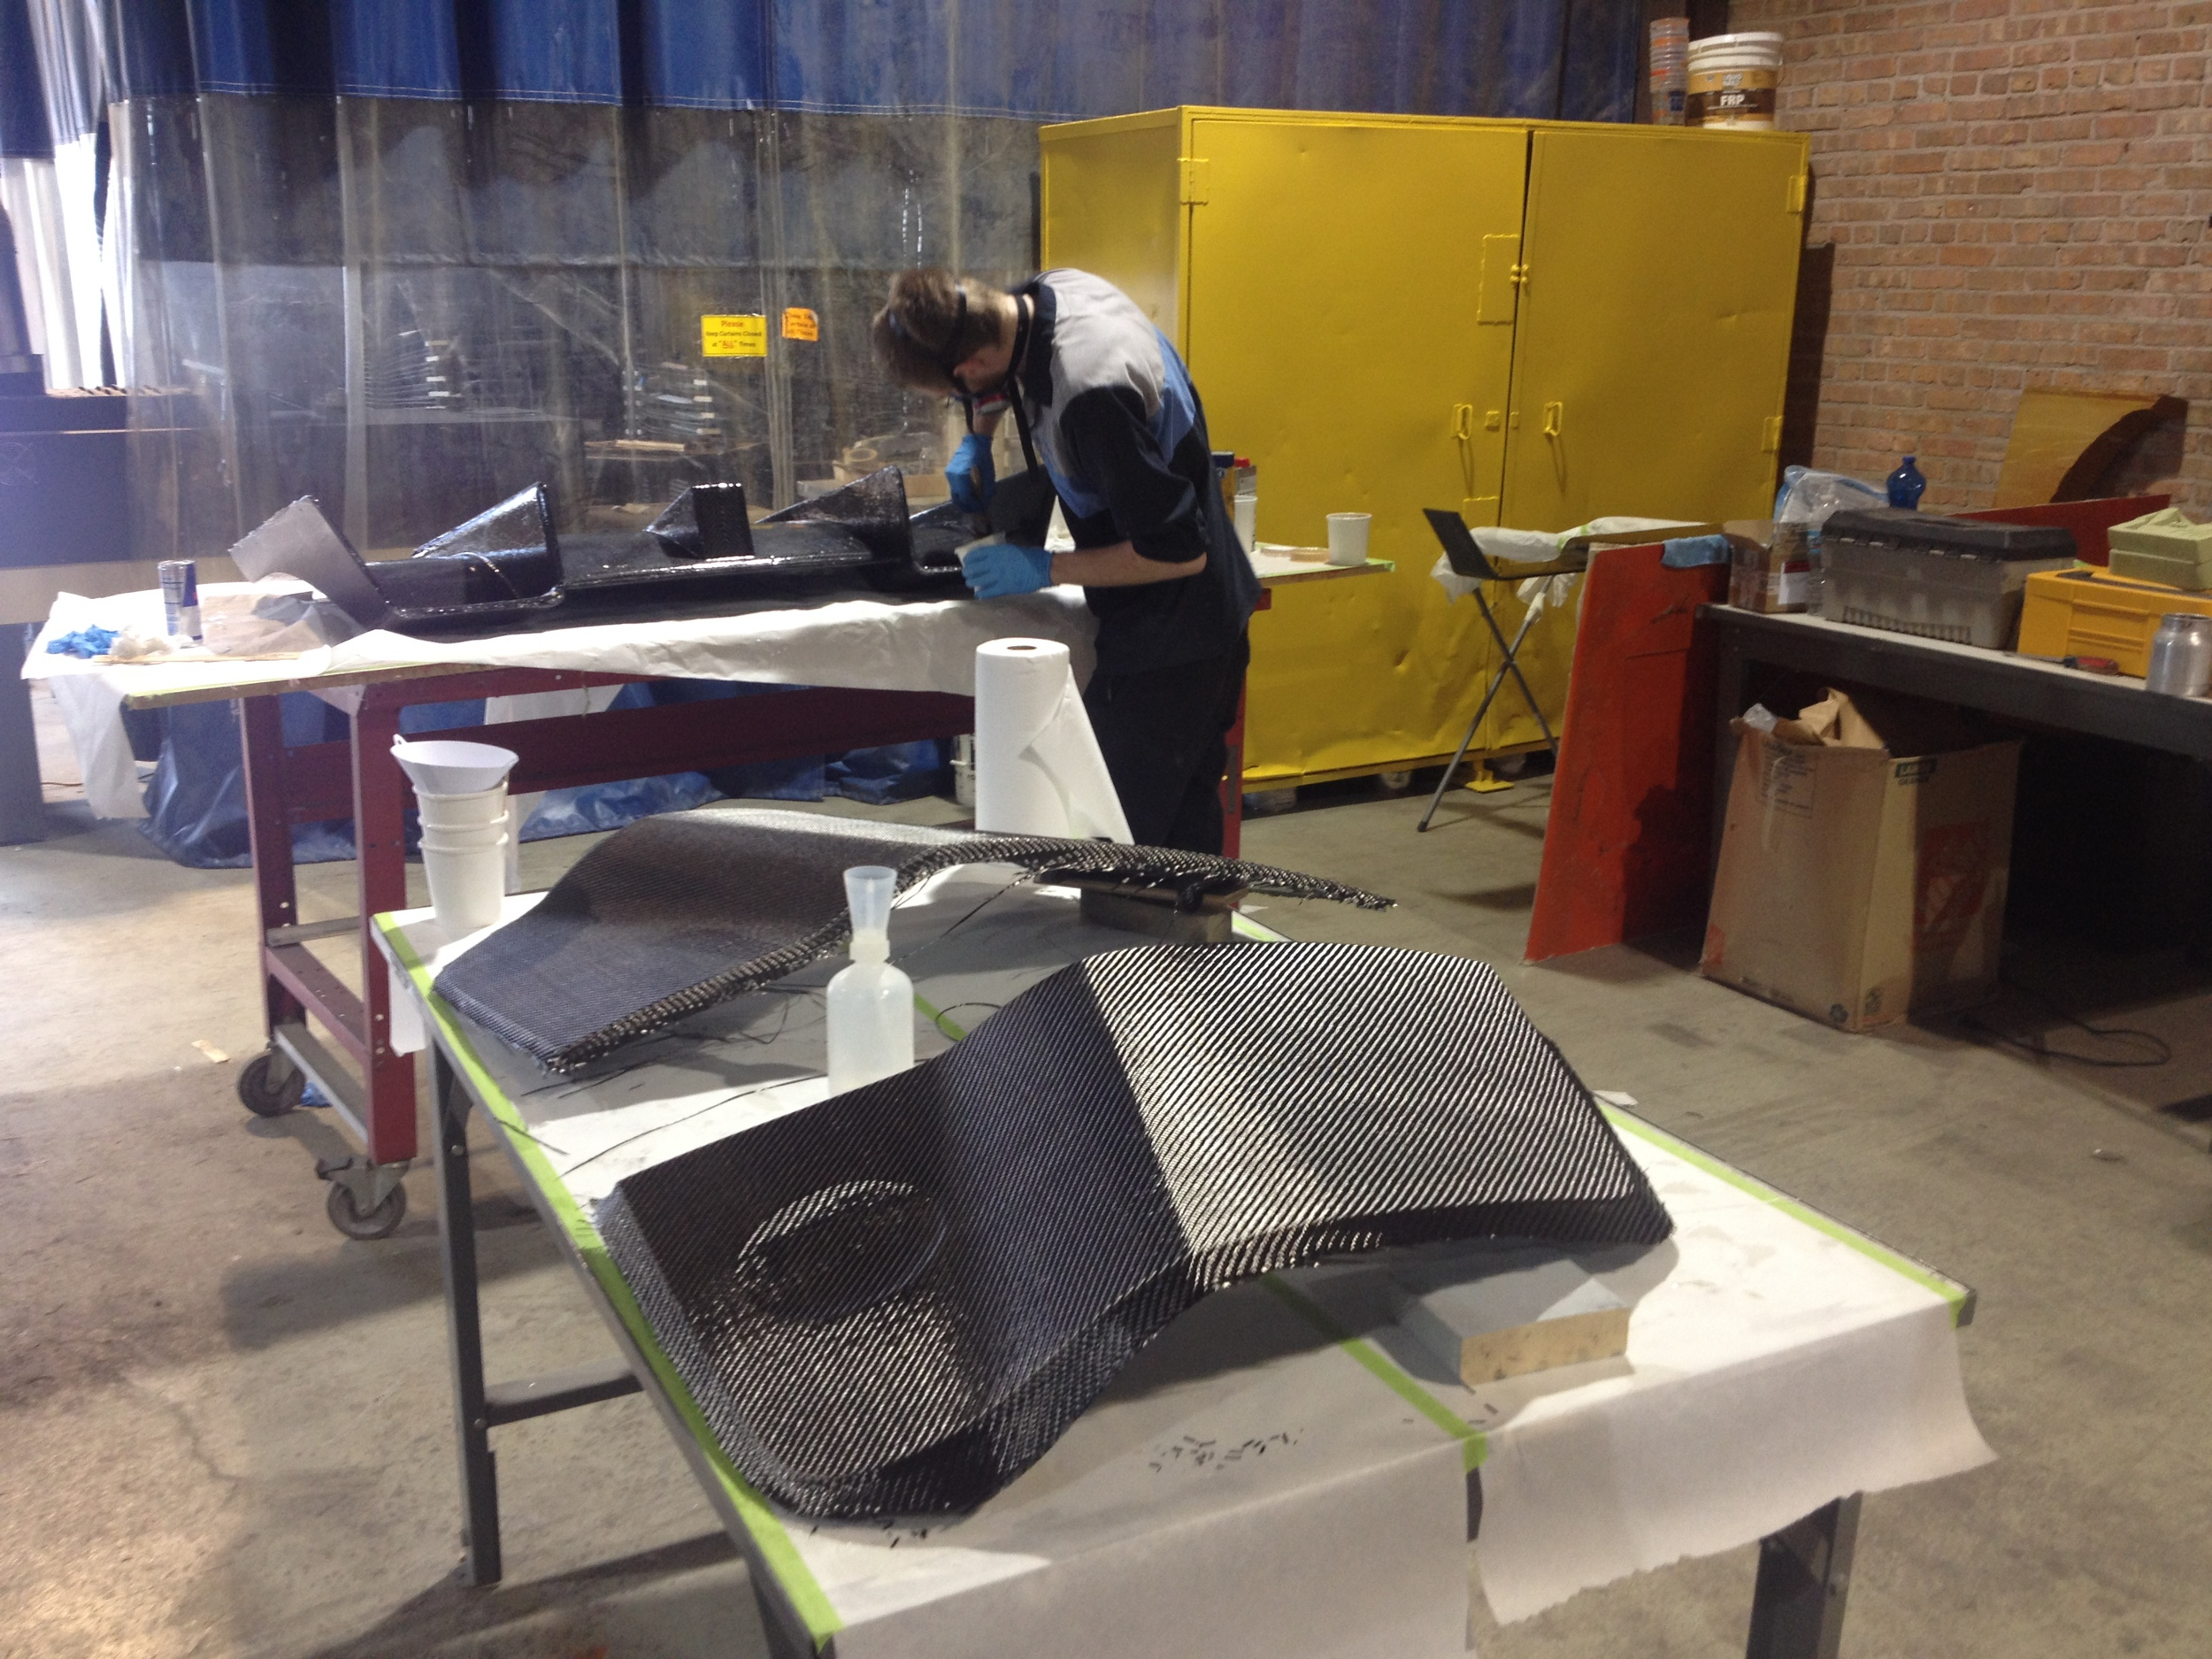 Materials Assistant working on carbon fiber carparts at Fiberworks in Chicago.